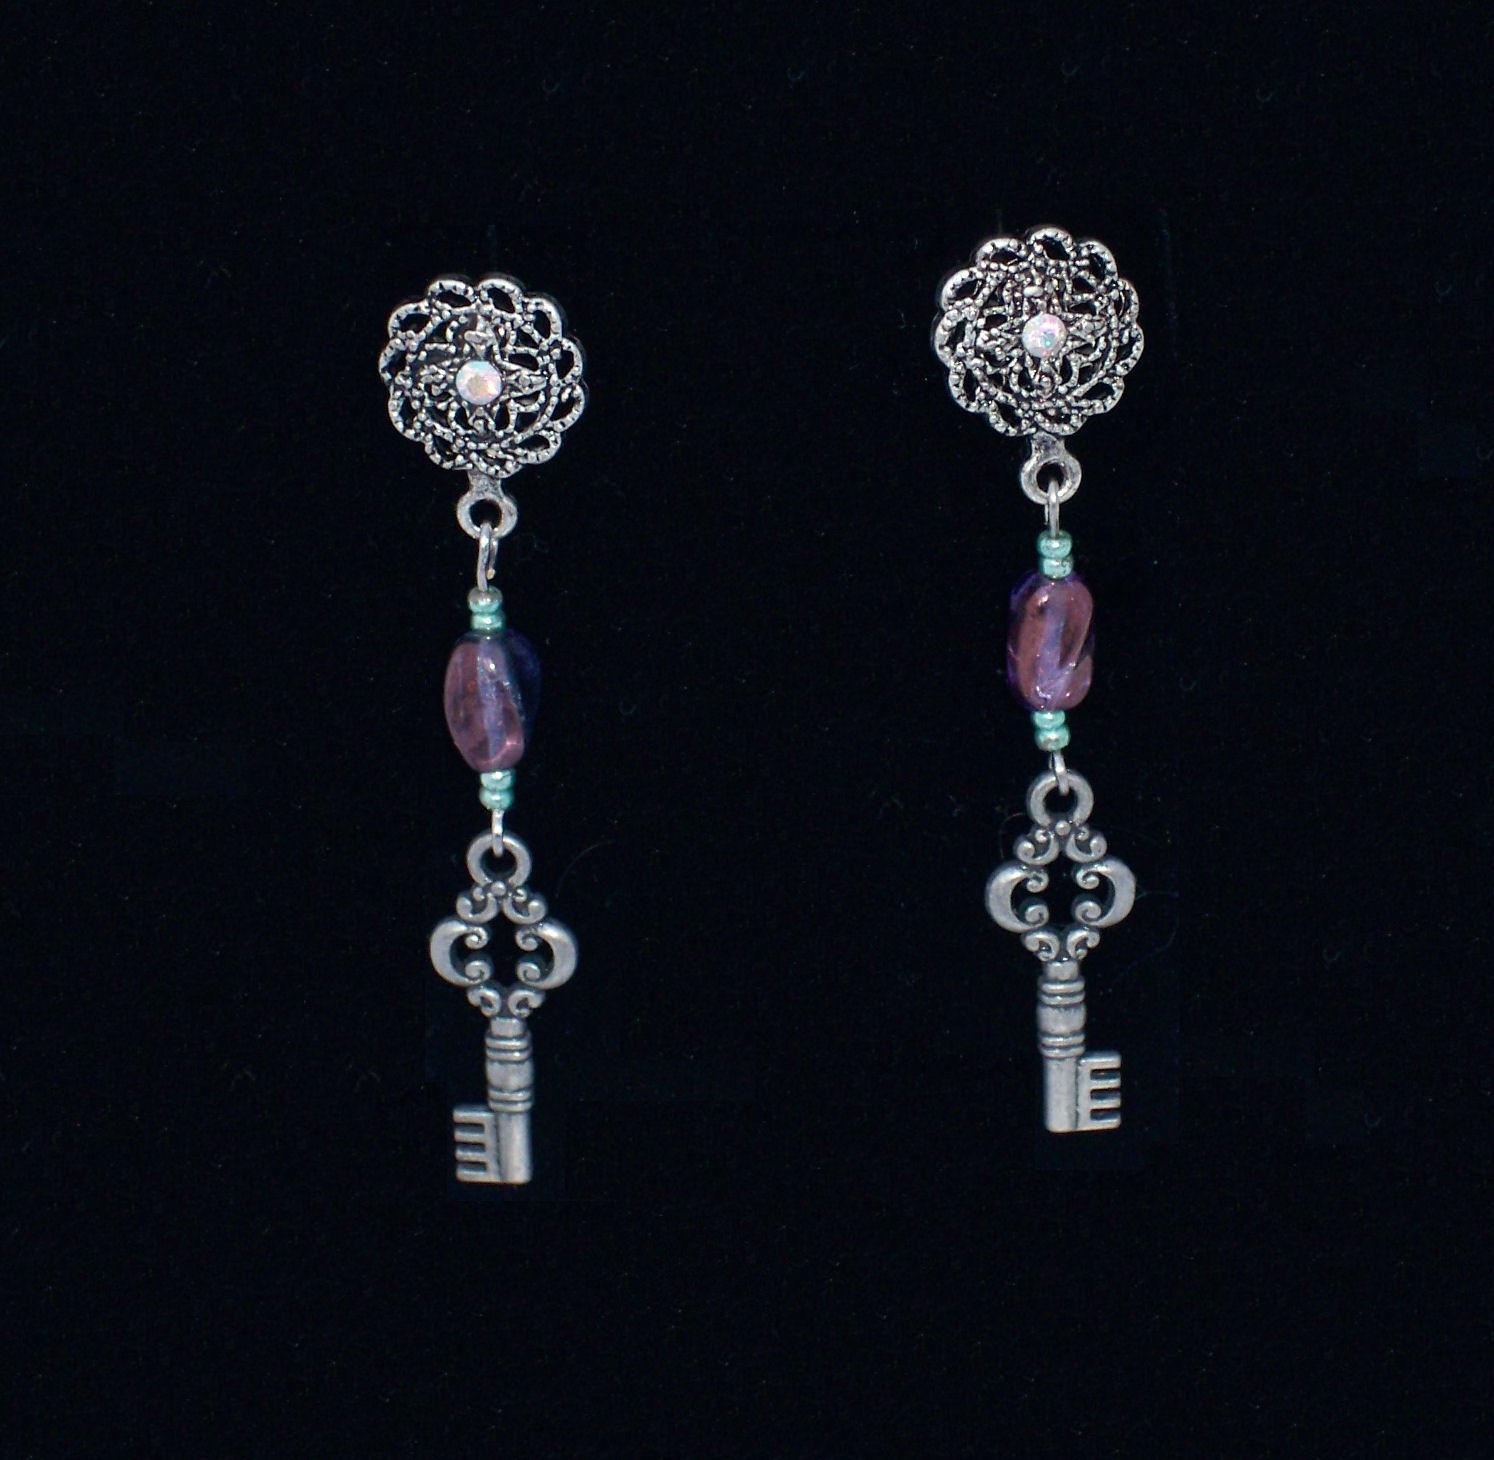 purple_drop_stone_skeleton_key_earrings_6.jpg